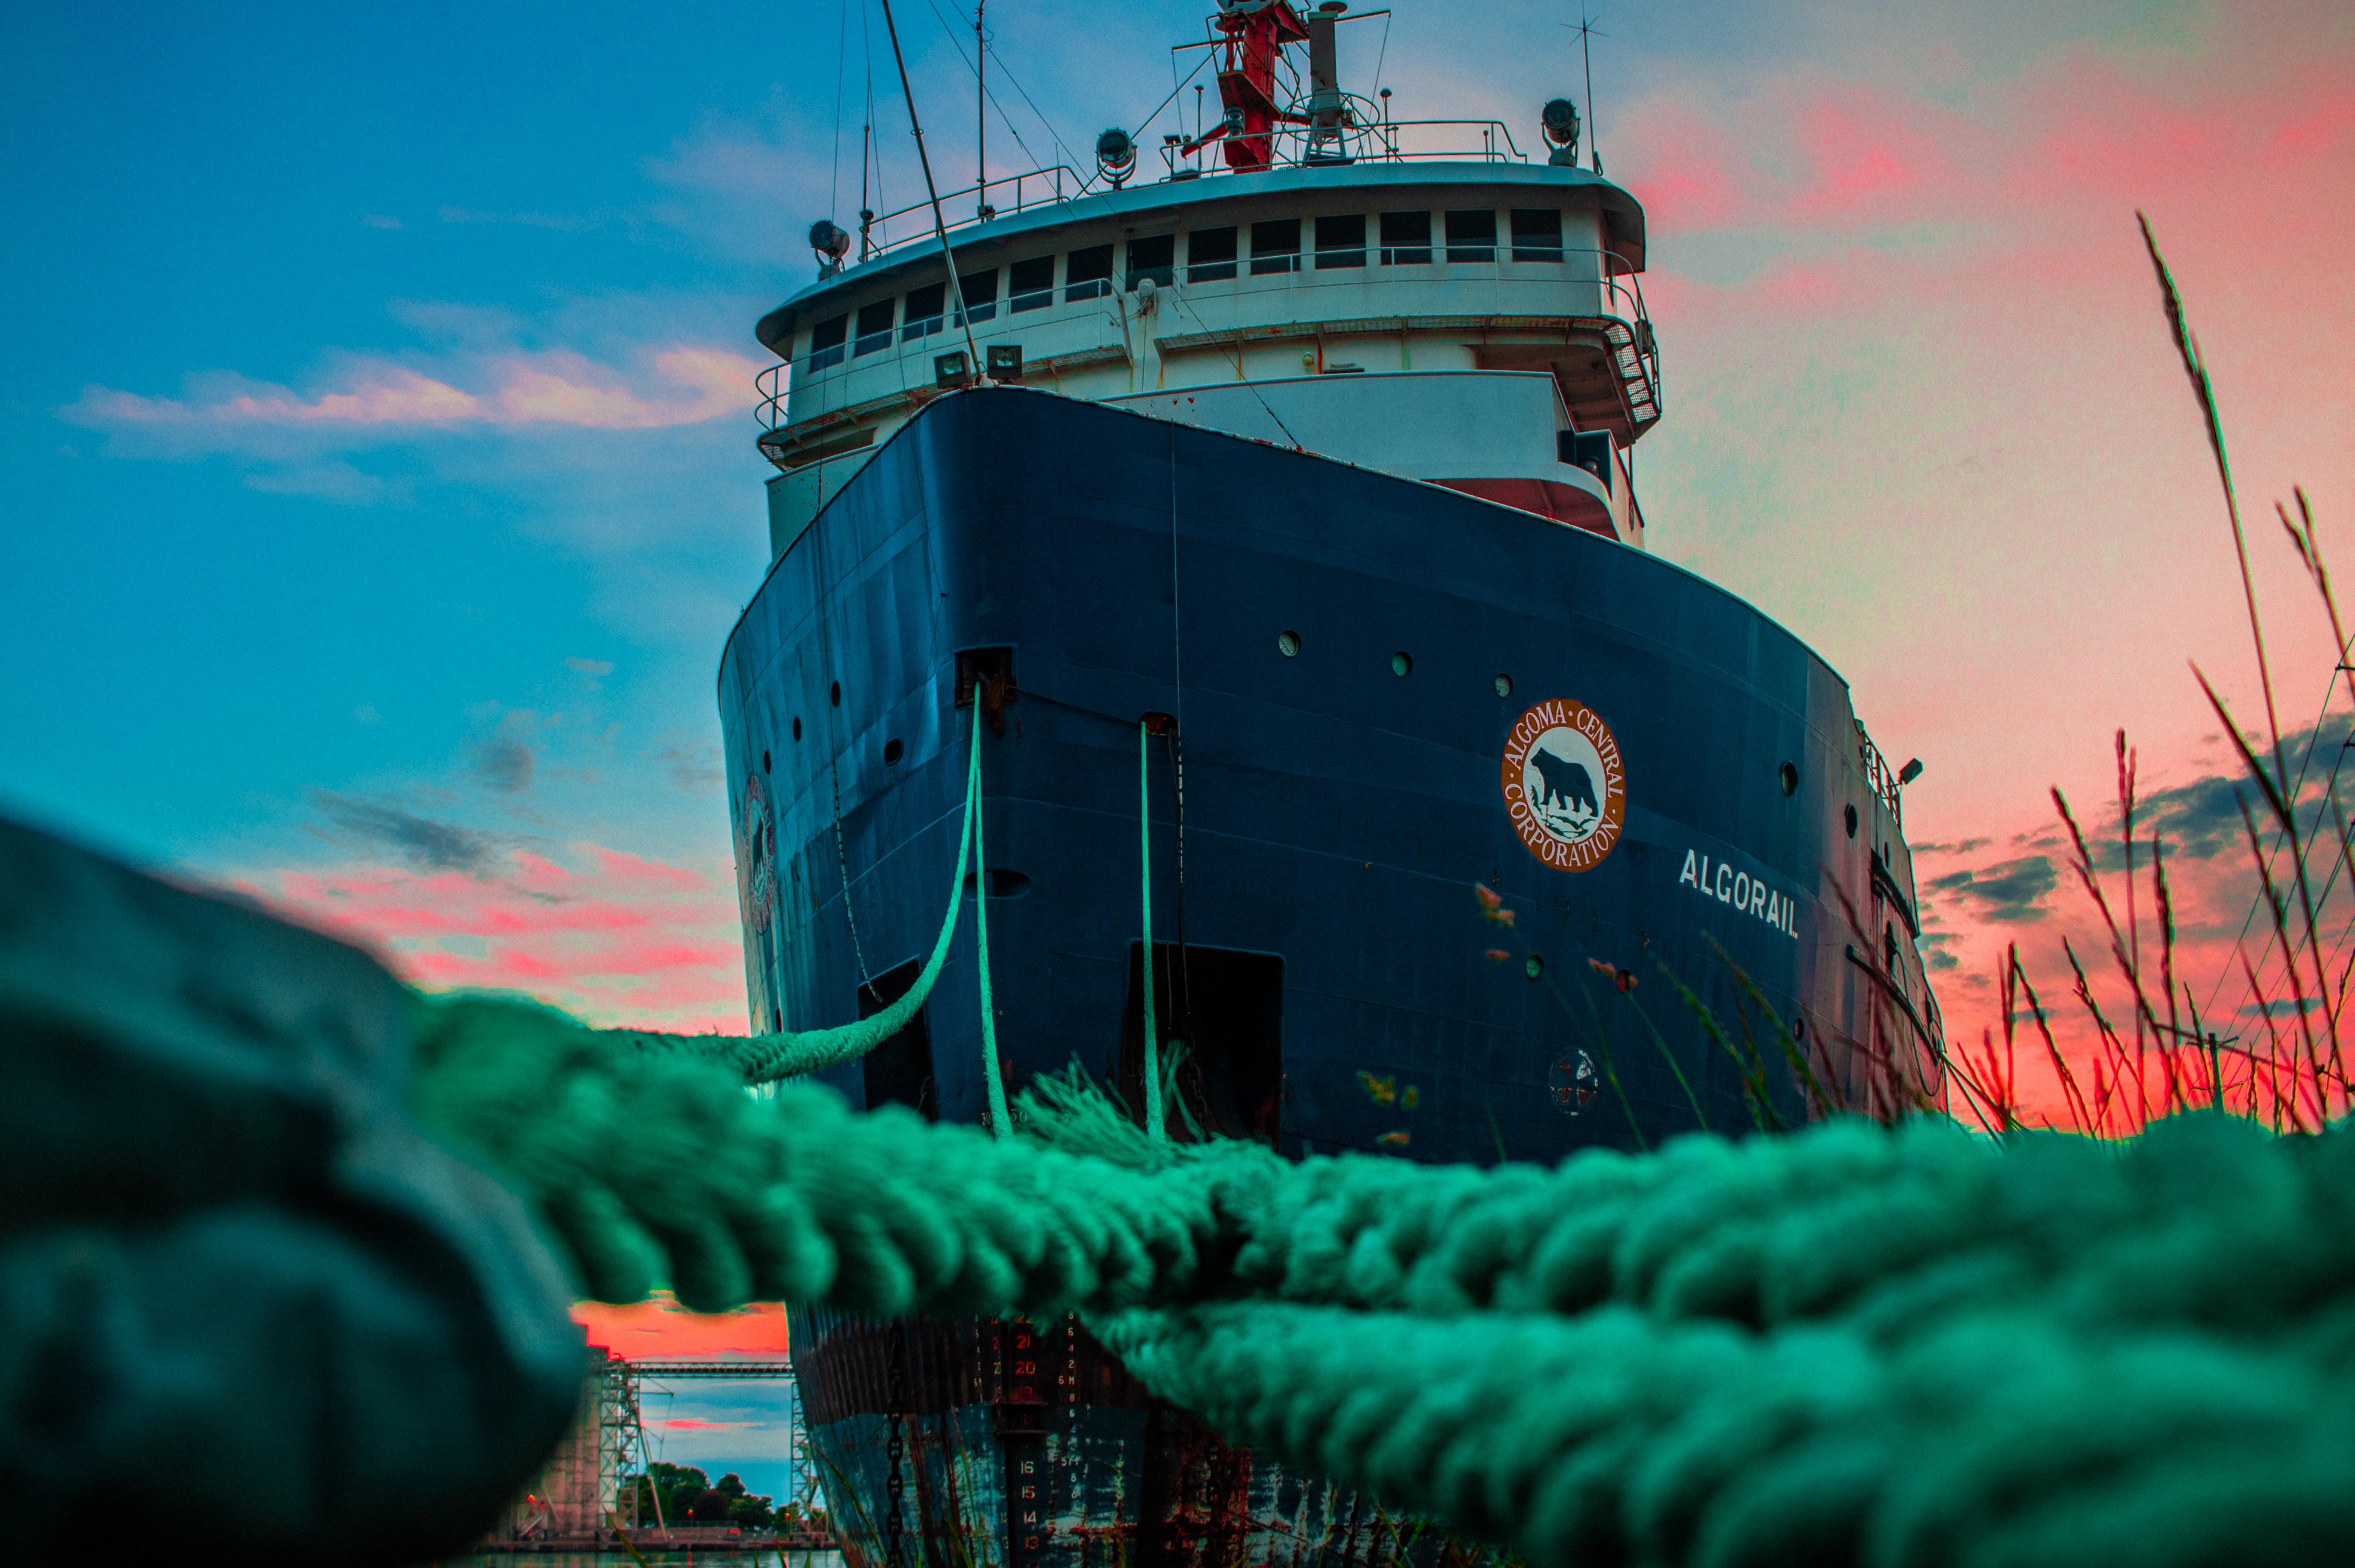 white and black ship on shipyard during daytime